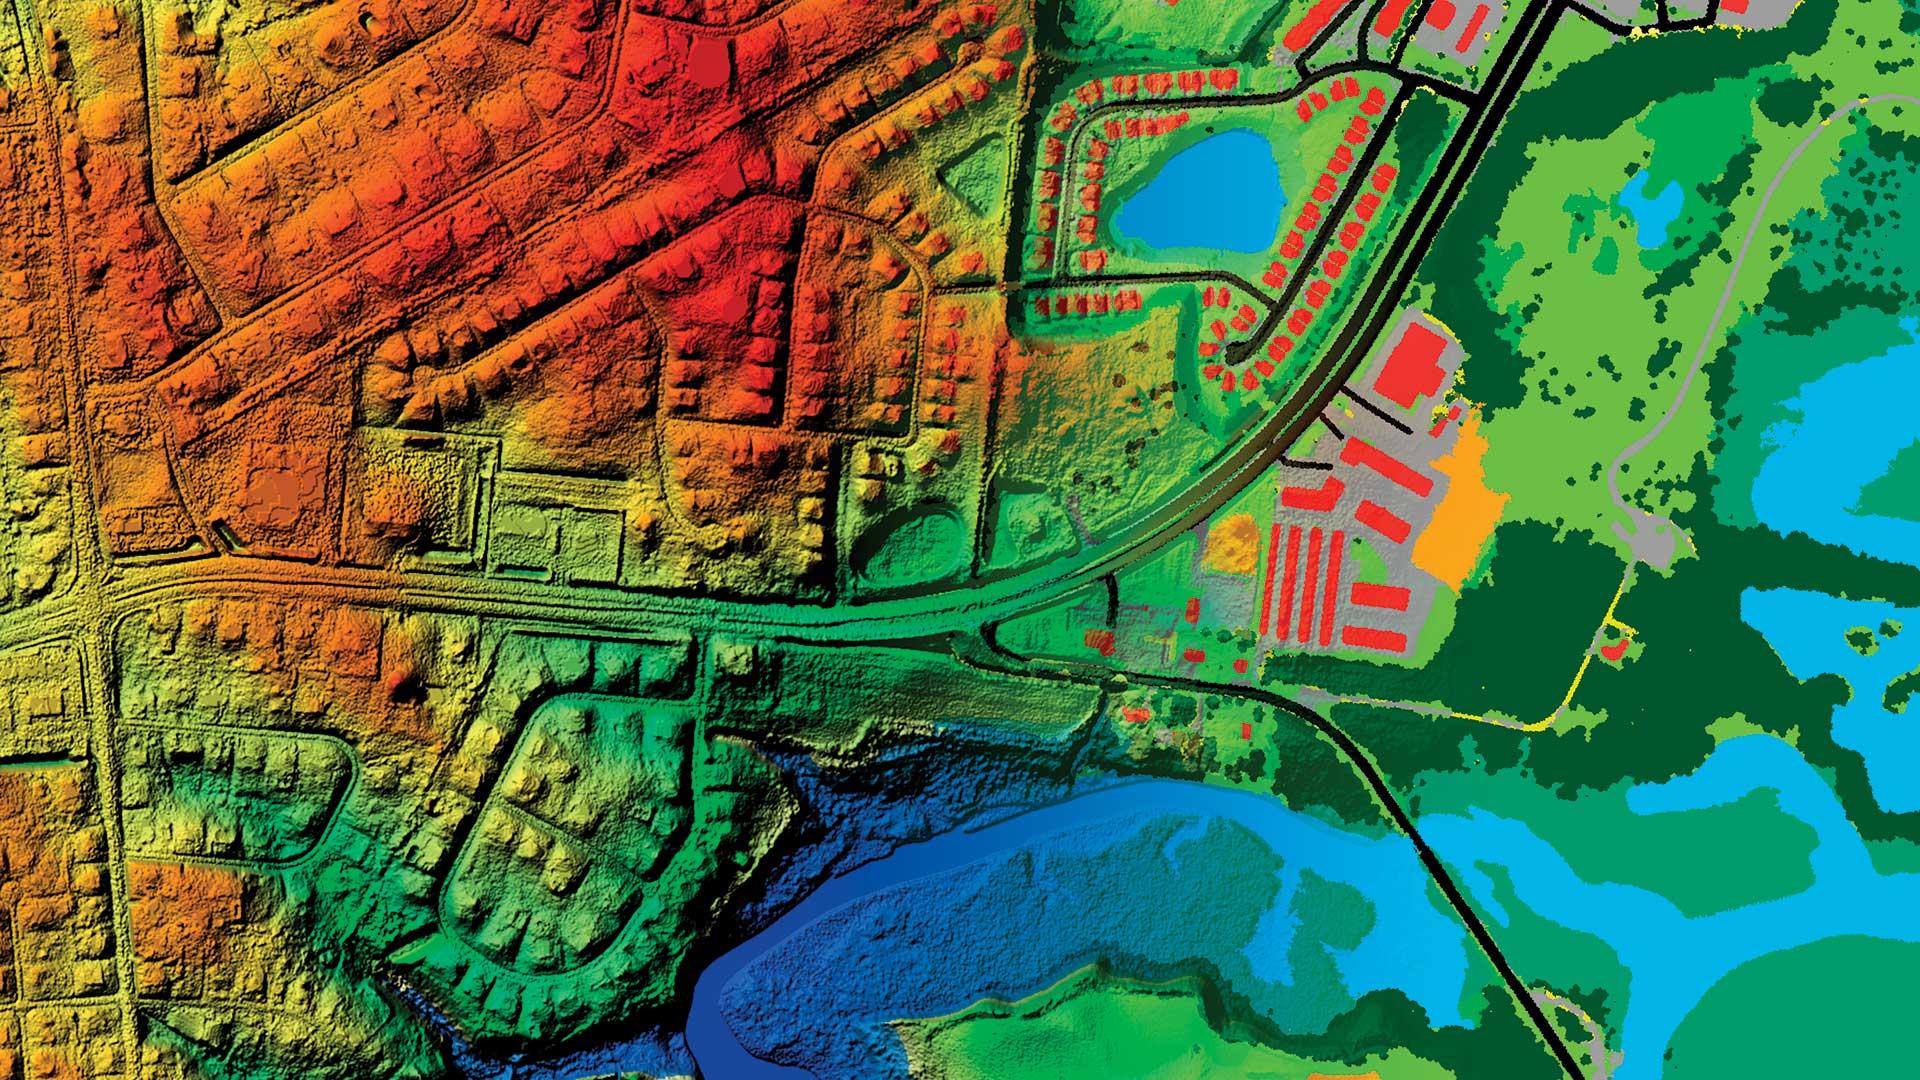 GIS and BIM Integration Leads to Smart Communities